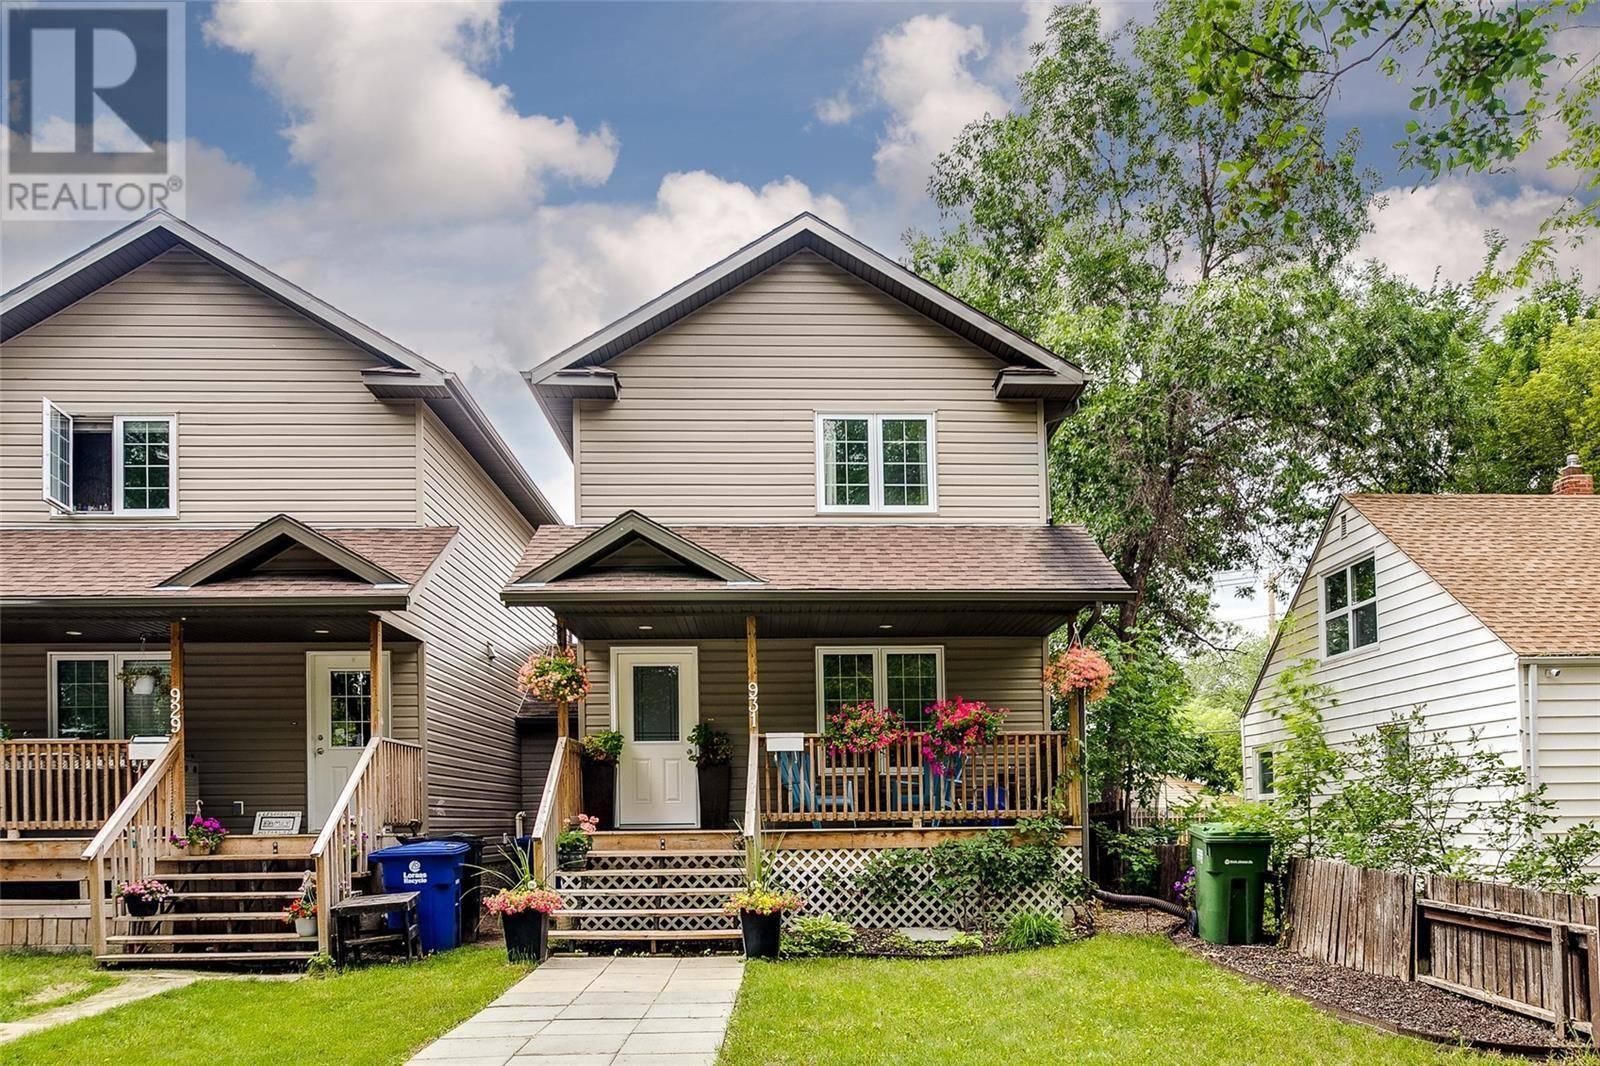 House for sale at 931 I Ave N Saskatoon Saskatchewan - MLS: SK782991